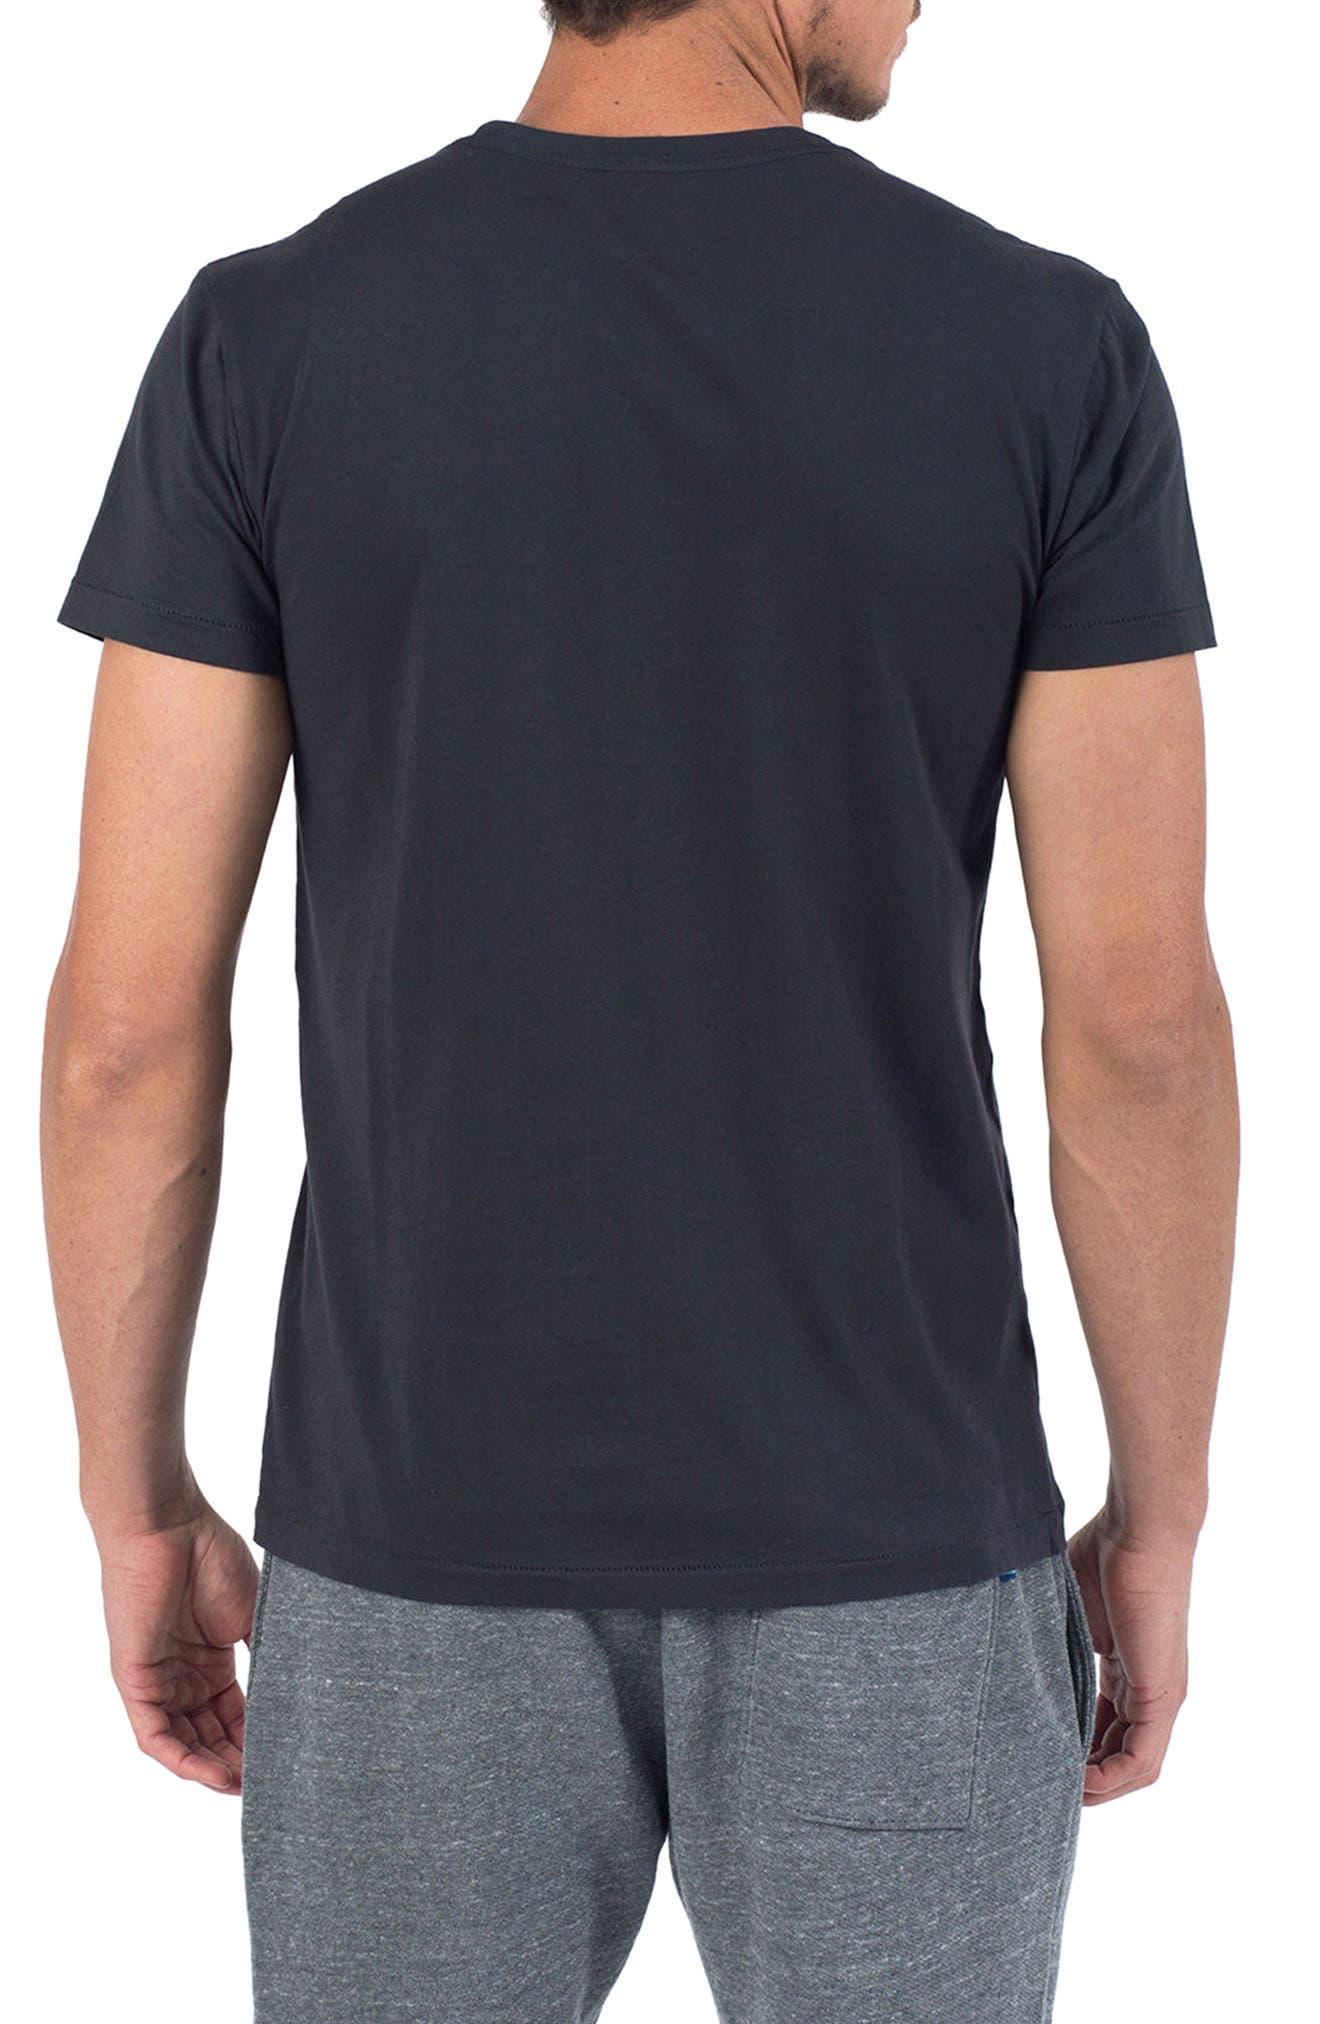 Rum Away T-Shirt,                             Alternate thumbnail 2, color,                             002